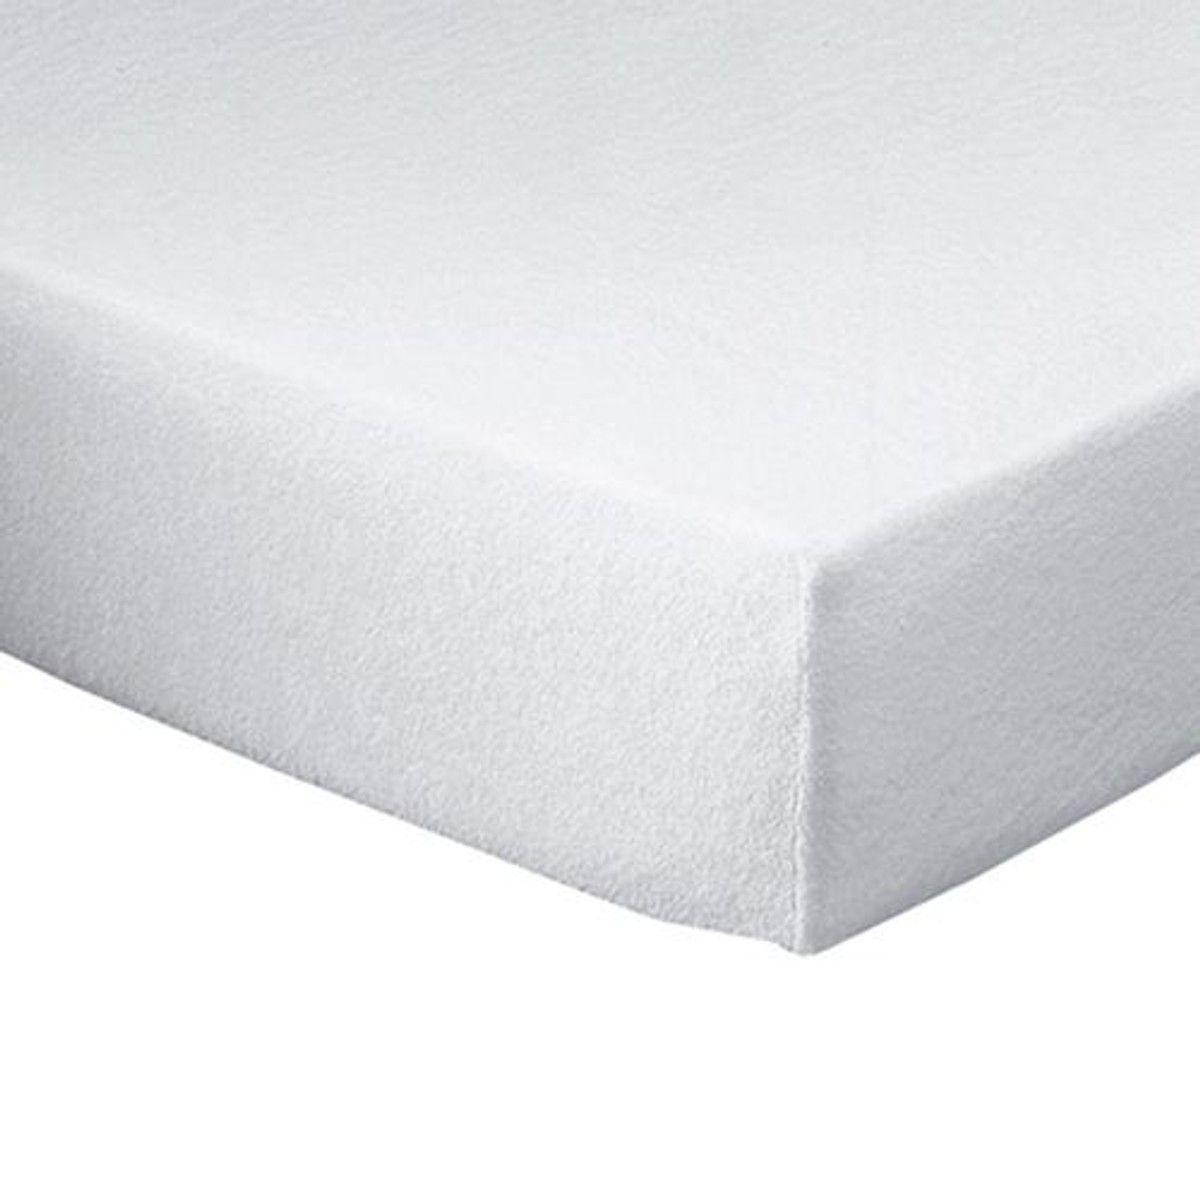 Protege Matelas Molleton Stretch Impermeable Taille 160x200 Cm